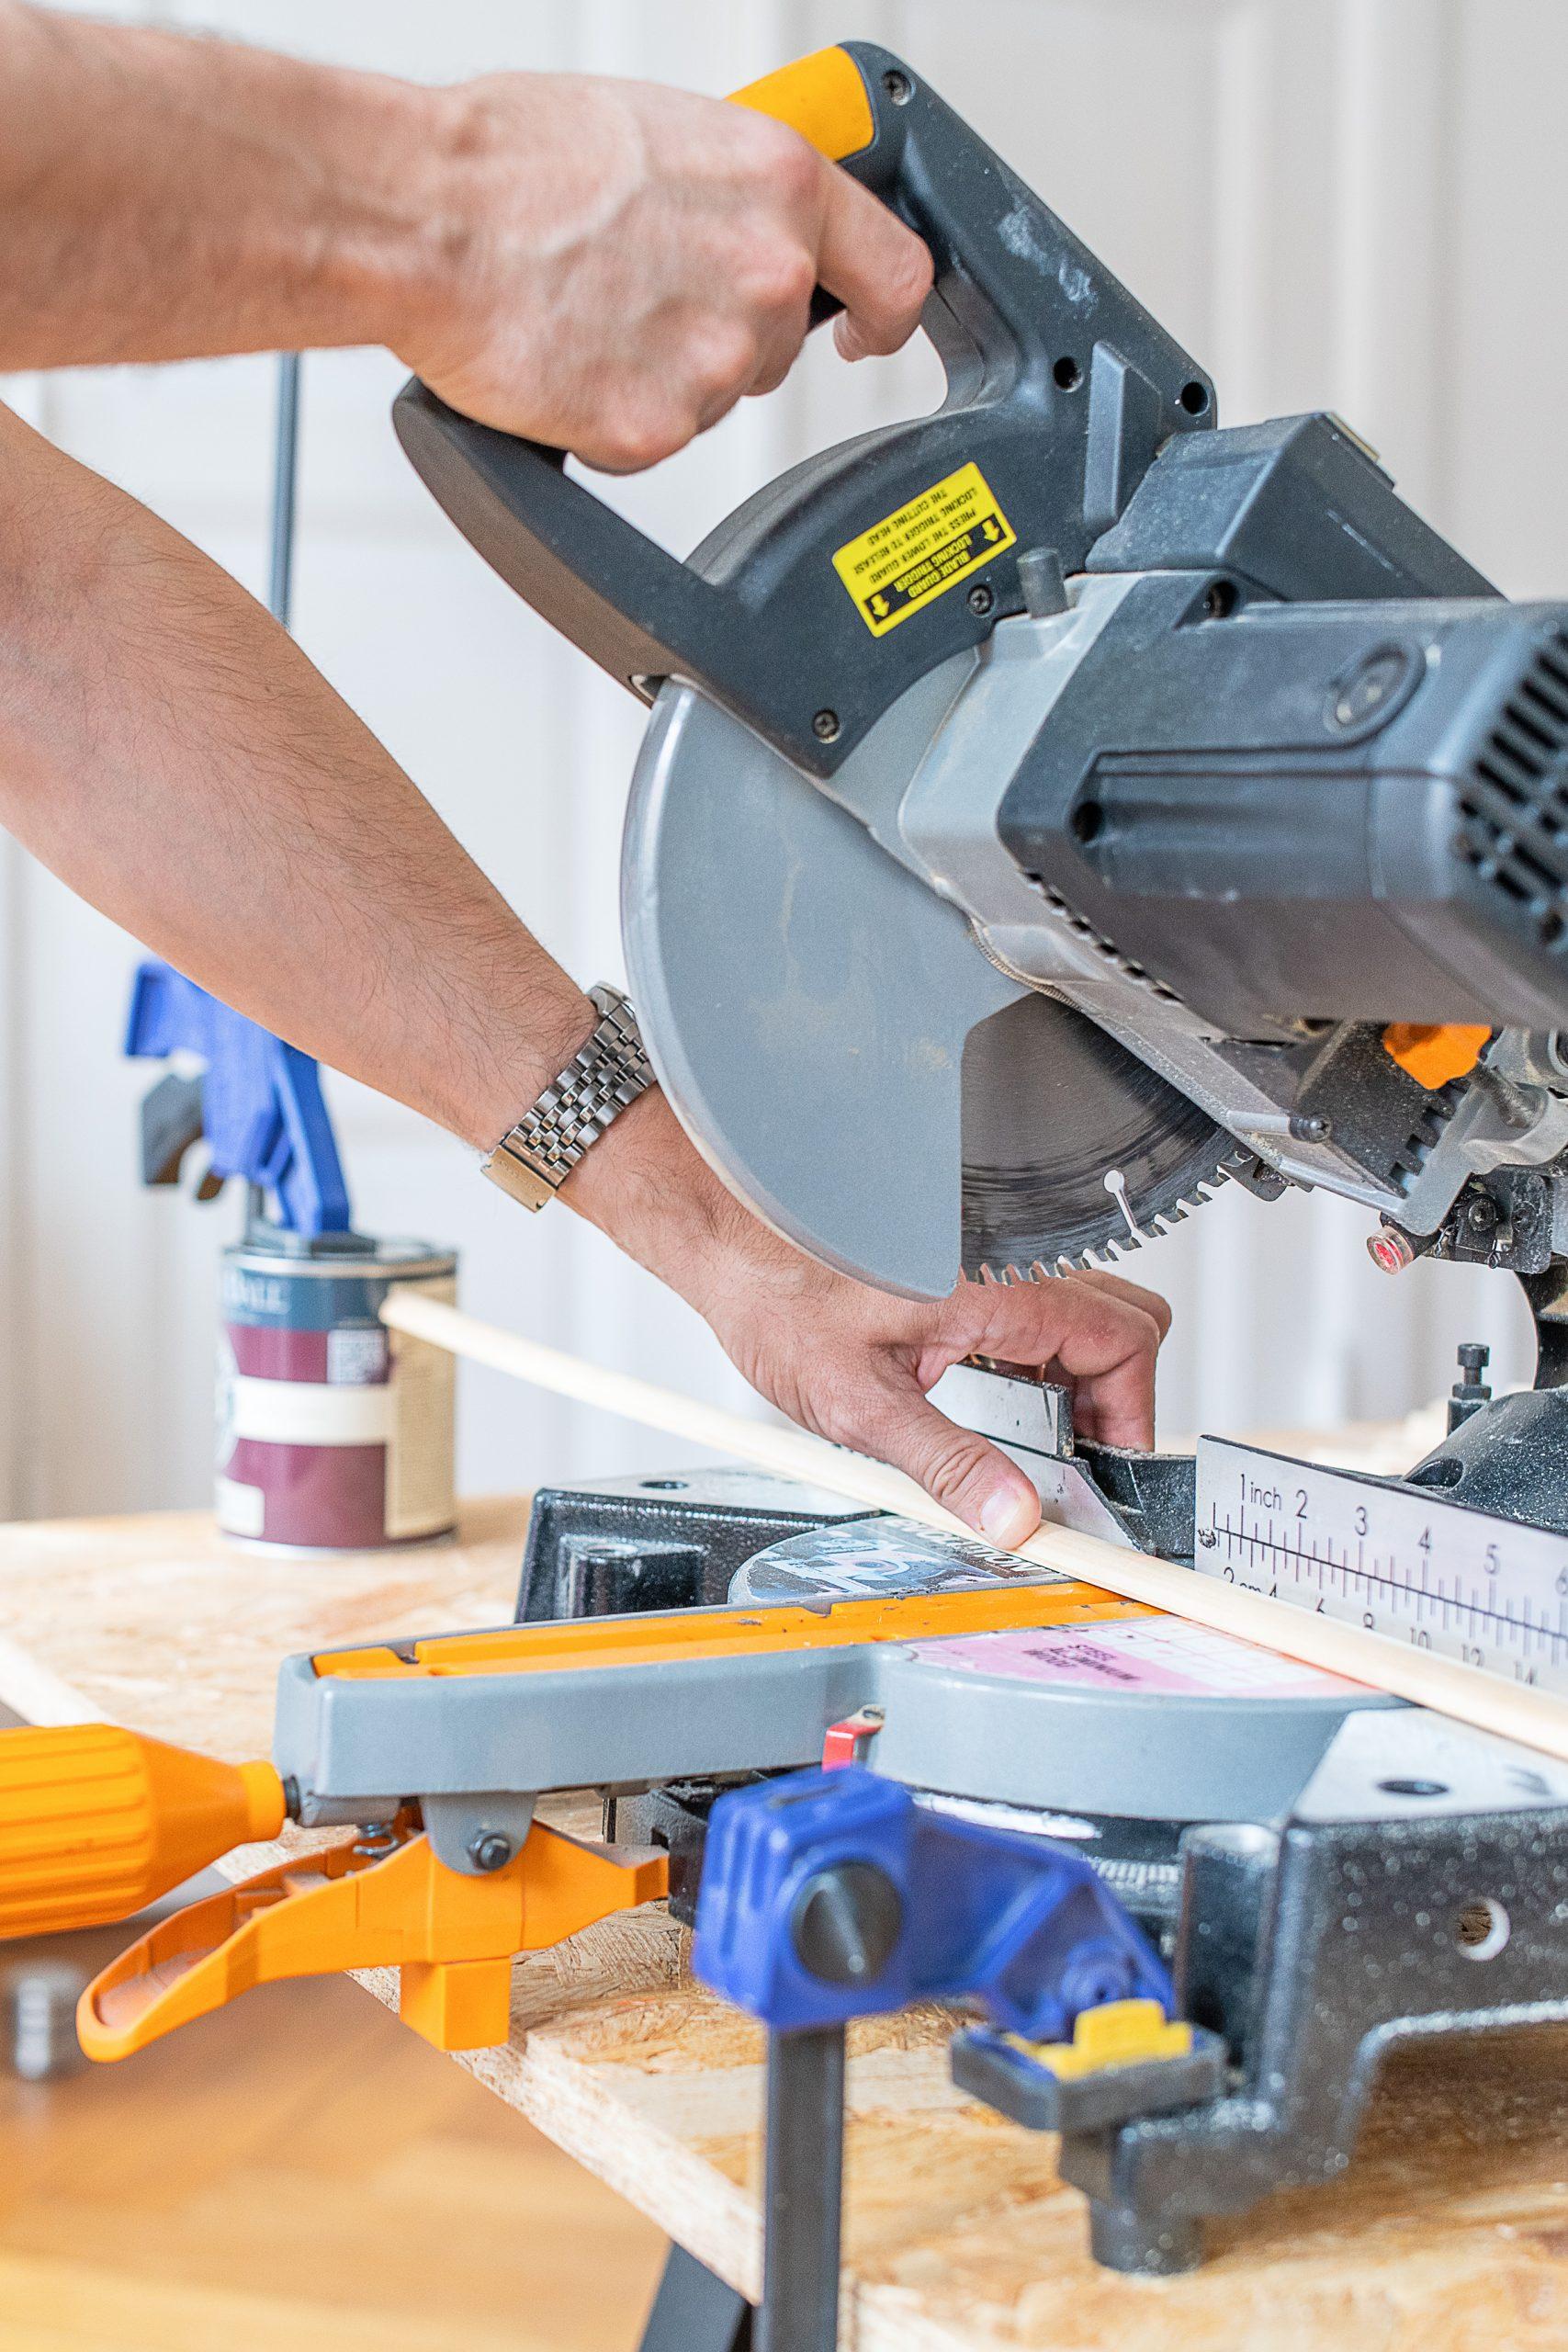 DIY Ribbed Sidetable - Cutting Slats